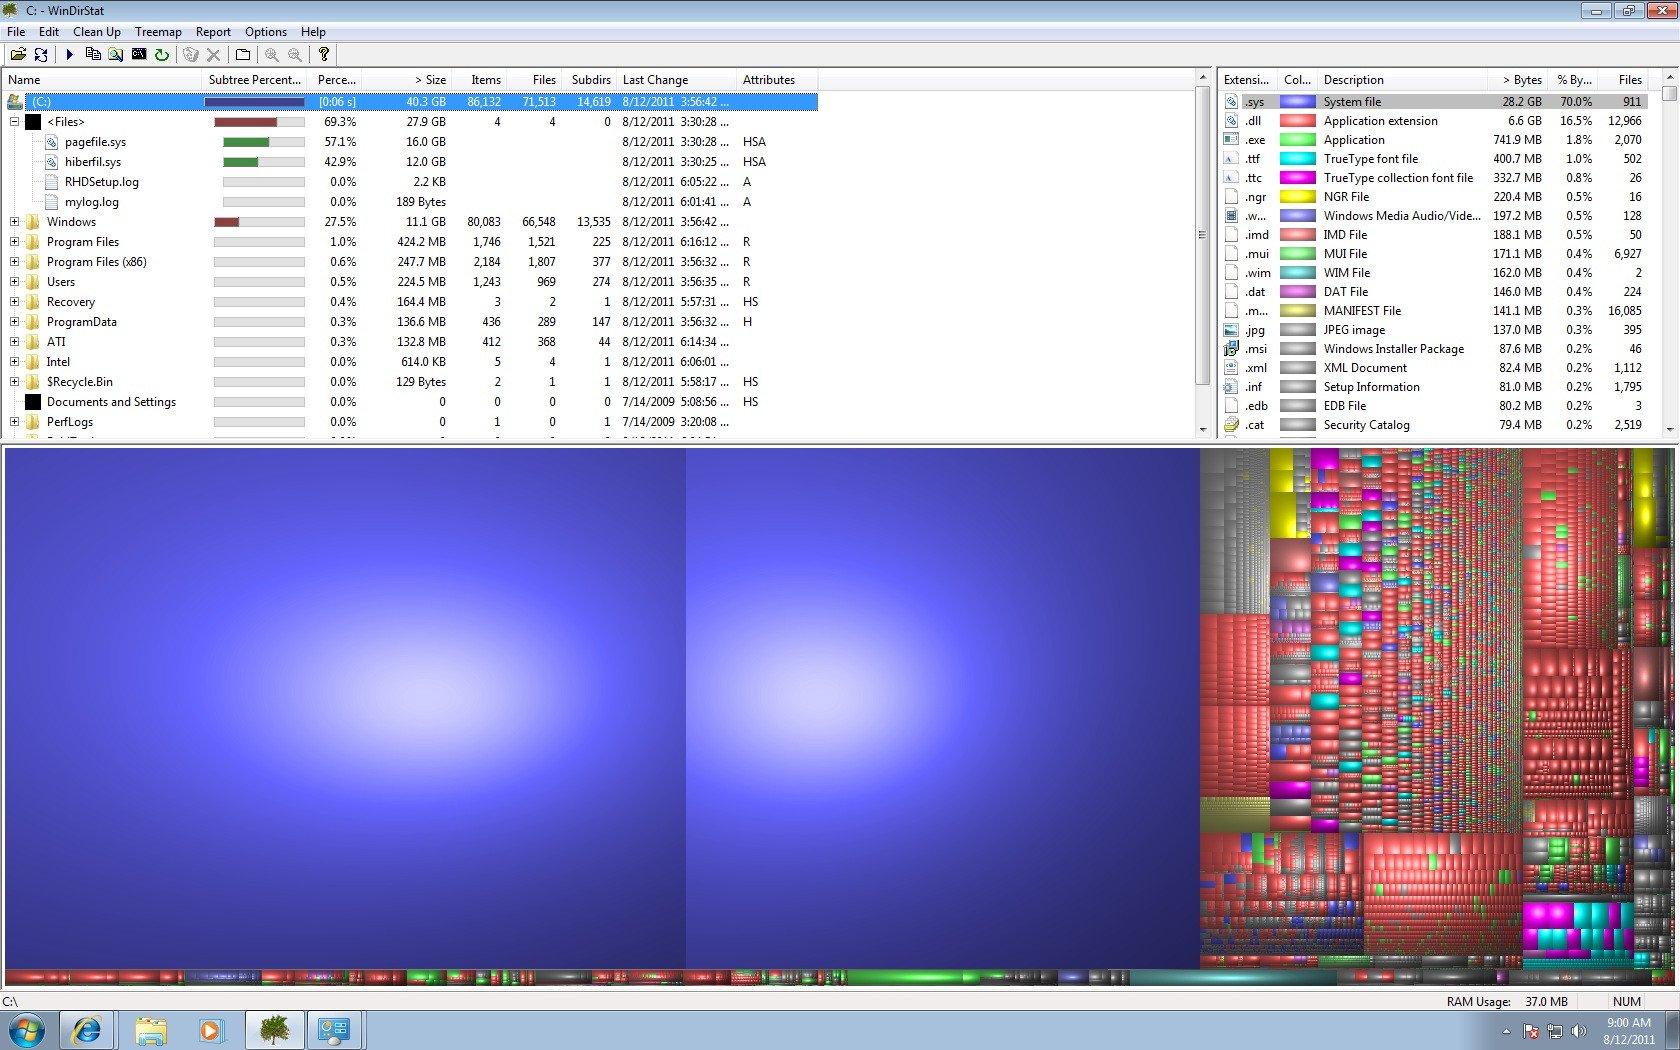 Windows ridurre hiberfil.sys e pagefile.sys con 16GB RAM | Servizi Linux Cloud